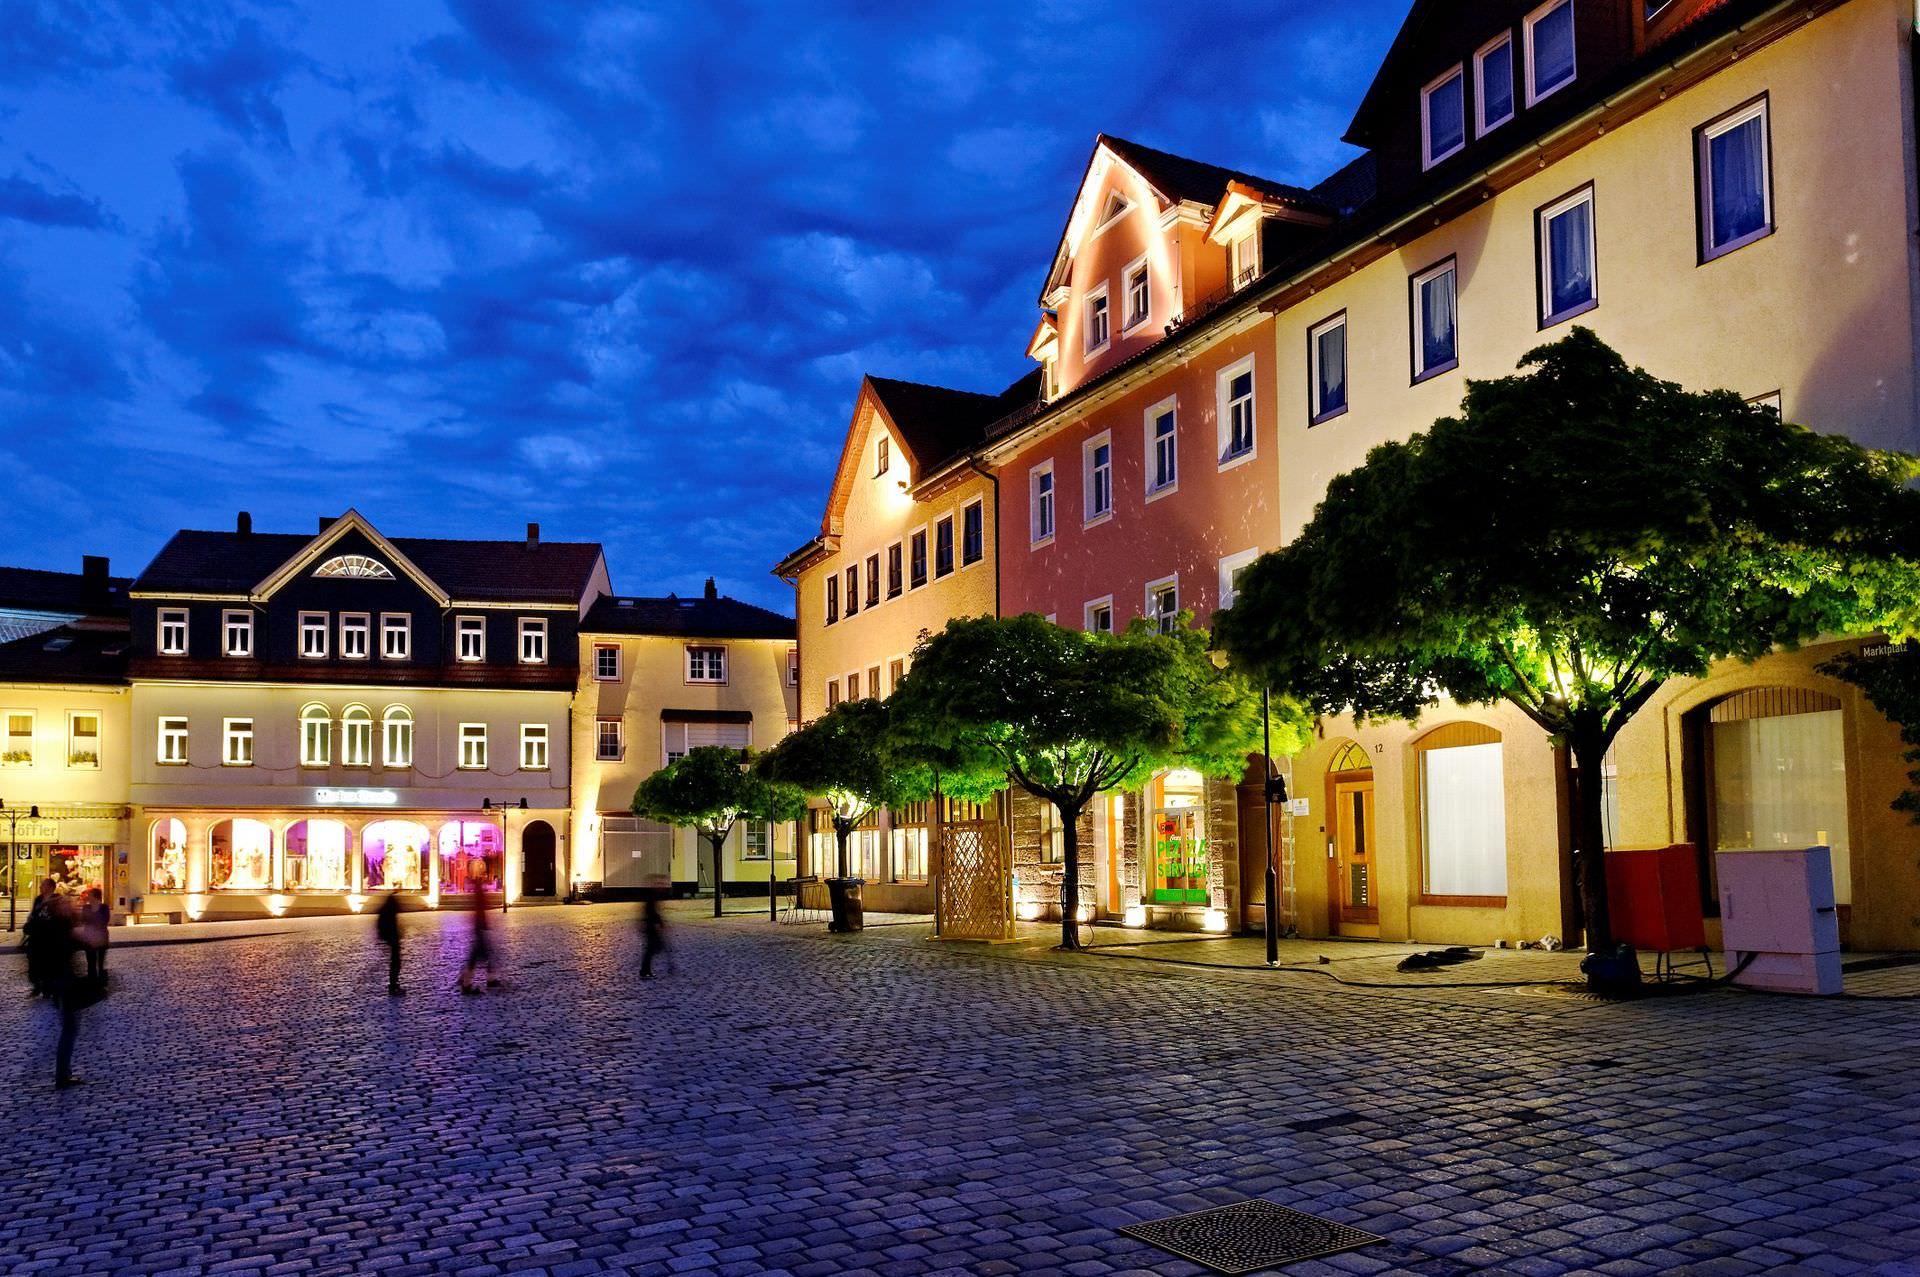 Hure Neustadt bei Coburg